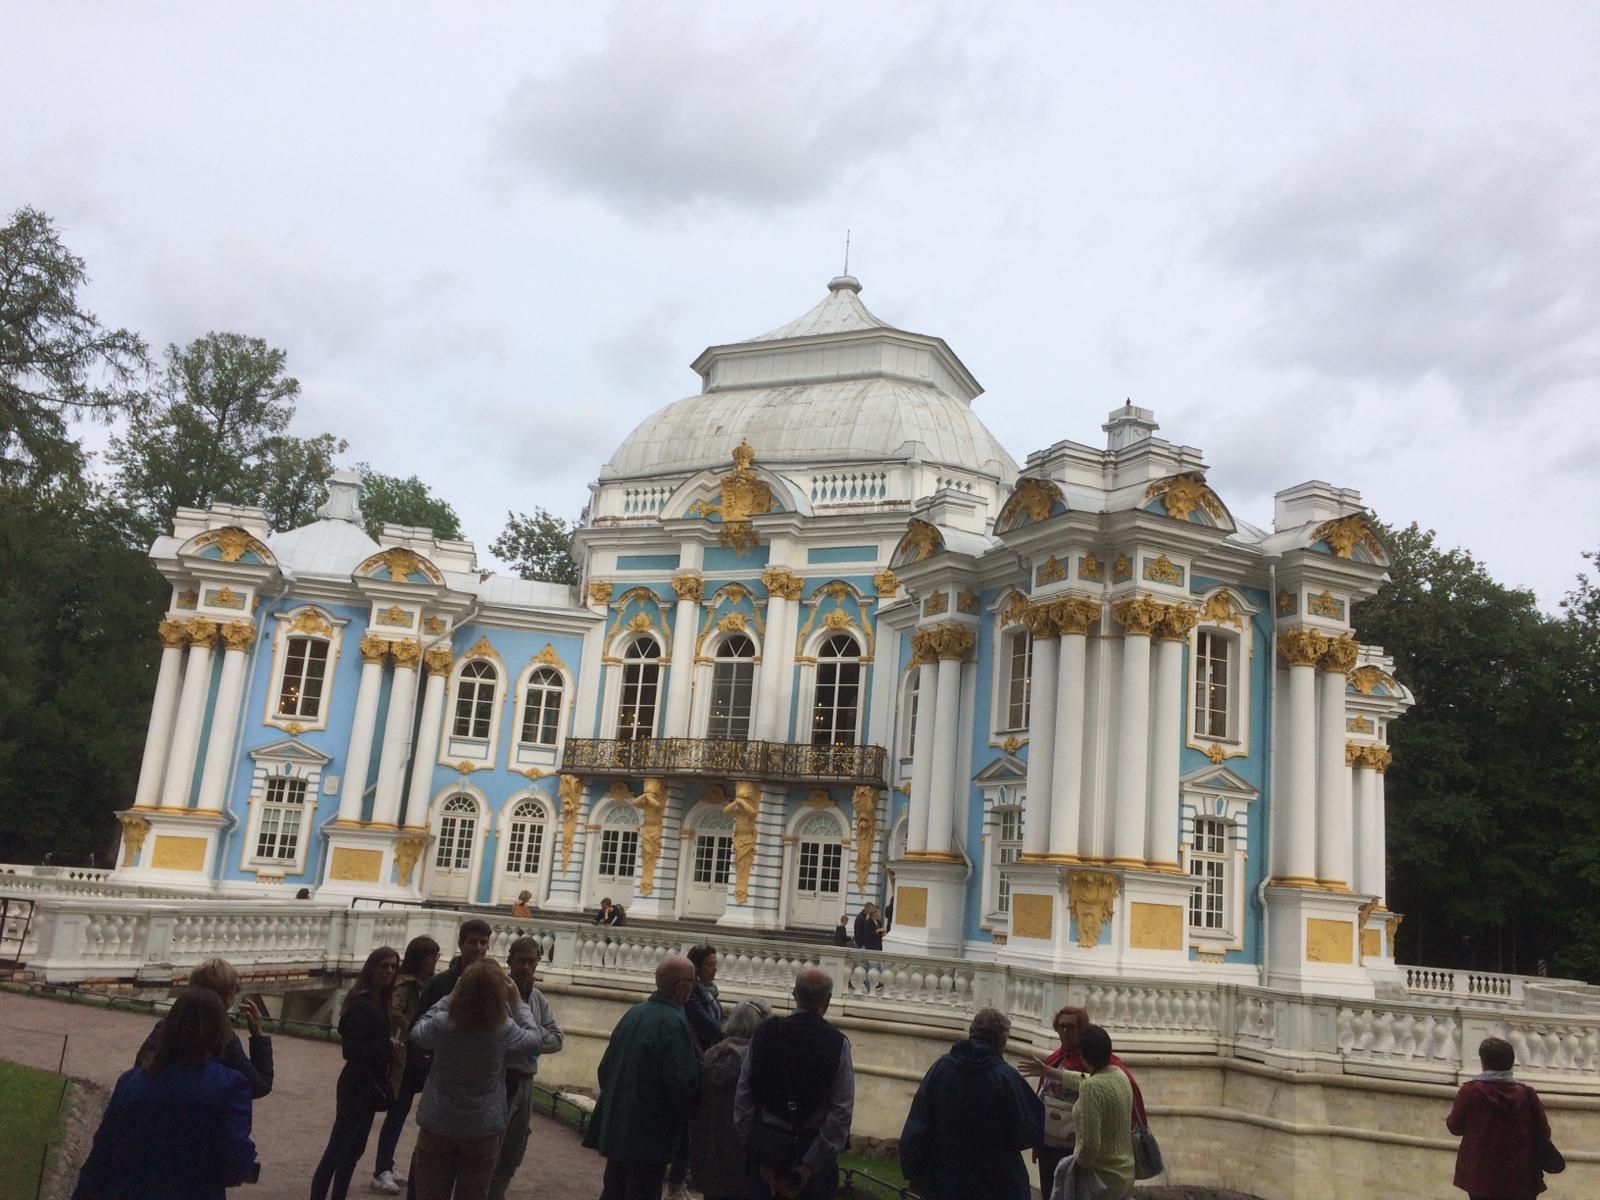 Adele e Anna dal 7 all'11 Agosto a San Pietroburgo. #ConcorsoFotograficoViaggiCarmen2019